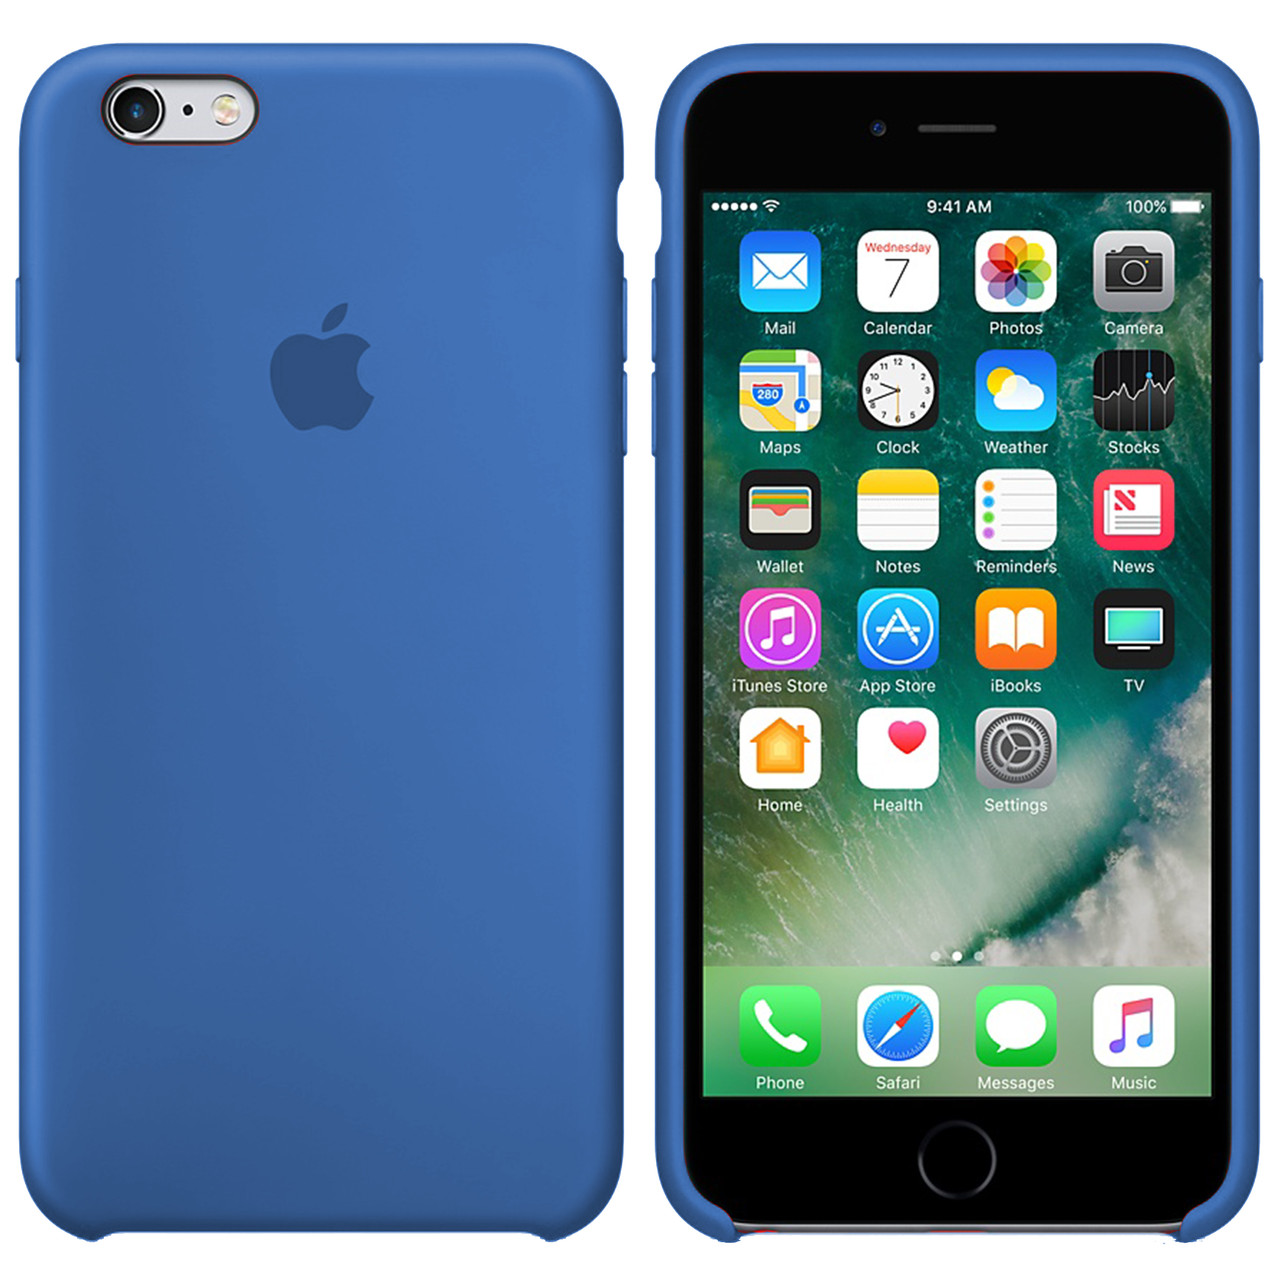 Силиконовый чехол для Apple iPhone 6 Plus / 6S Plus Silicone case (Лазурно-синий)